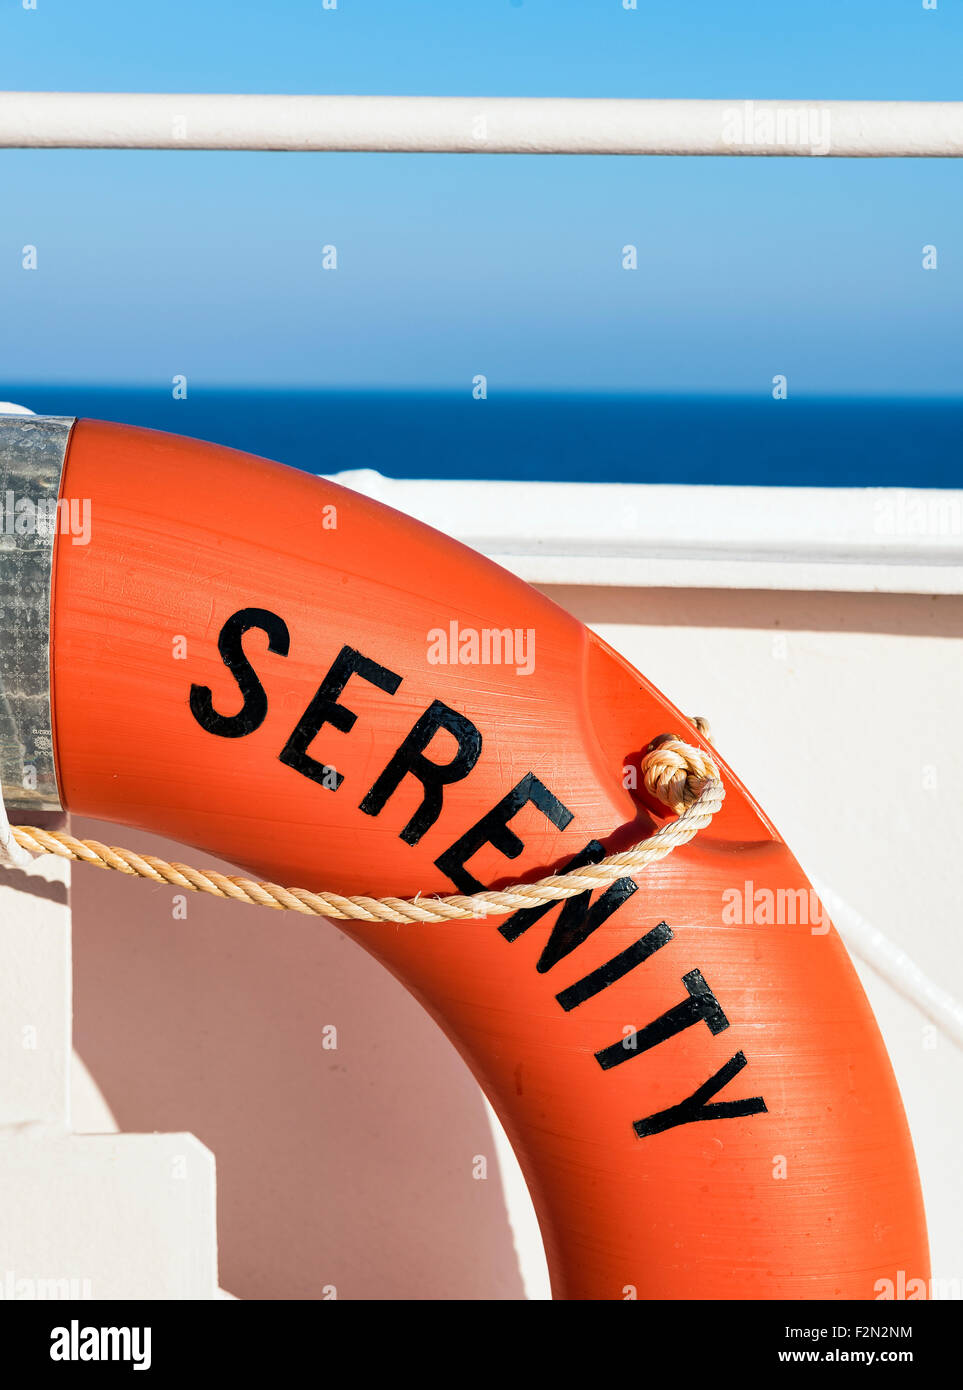 Serenity life saver. - Stock Image